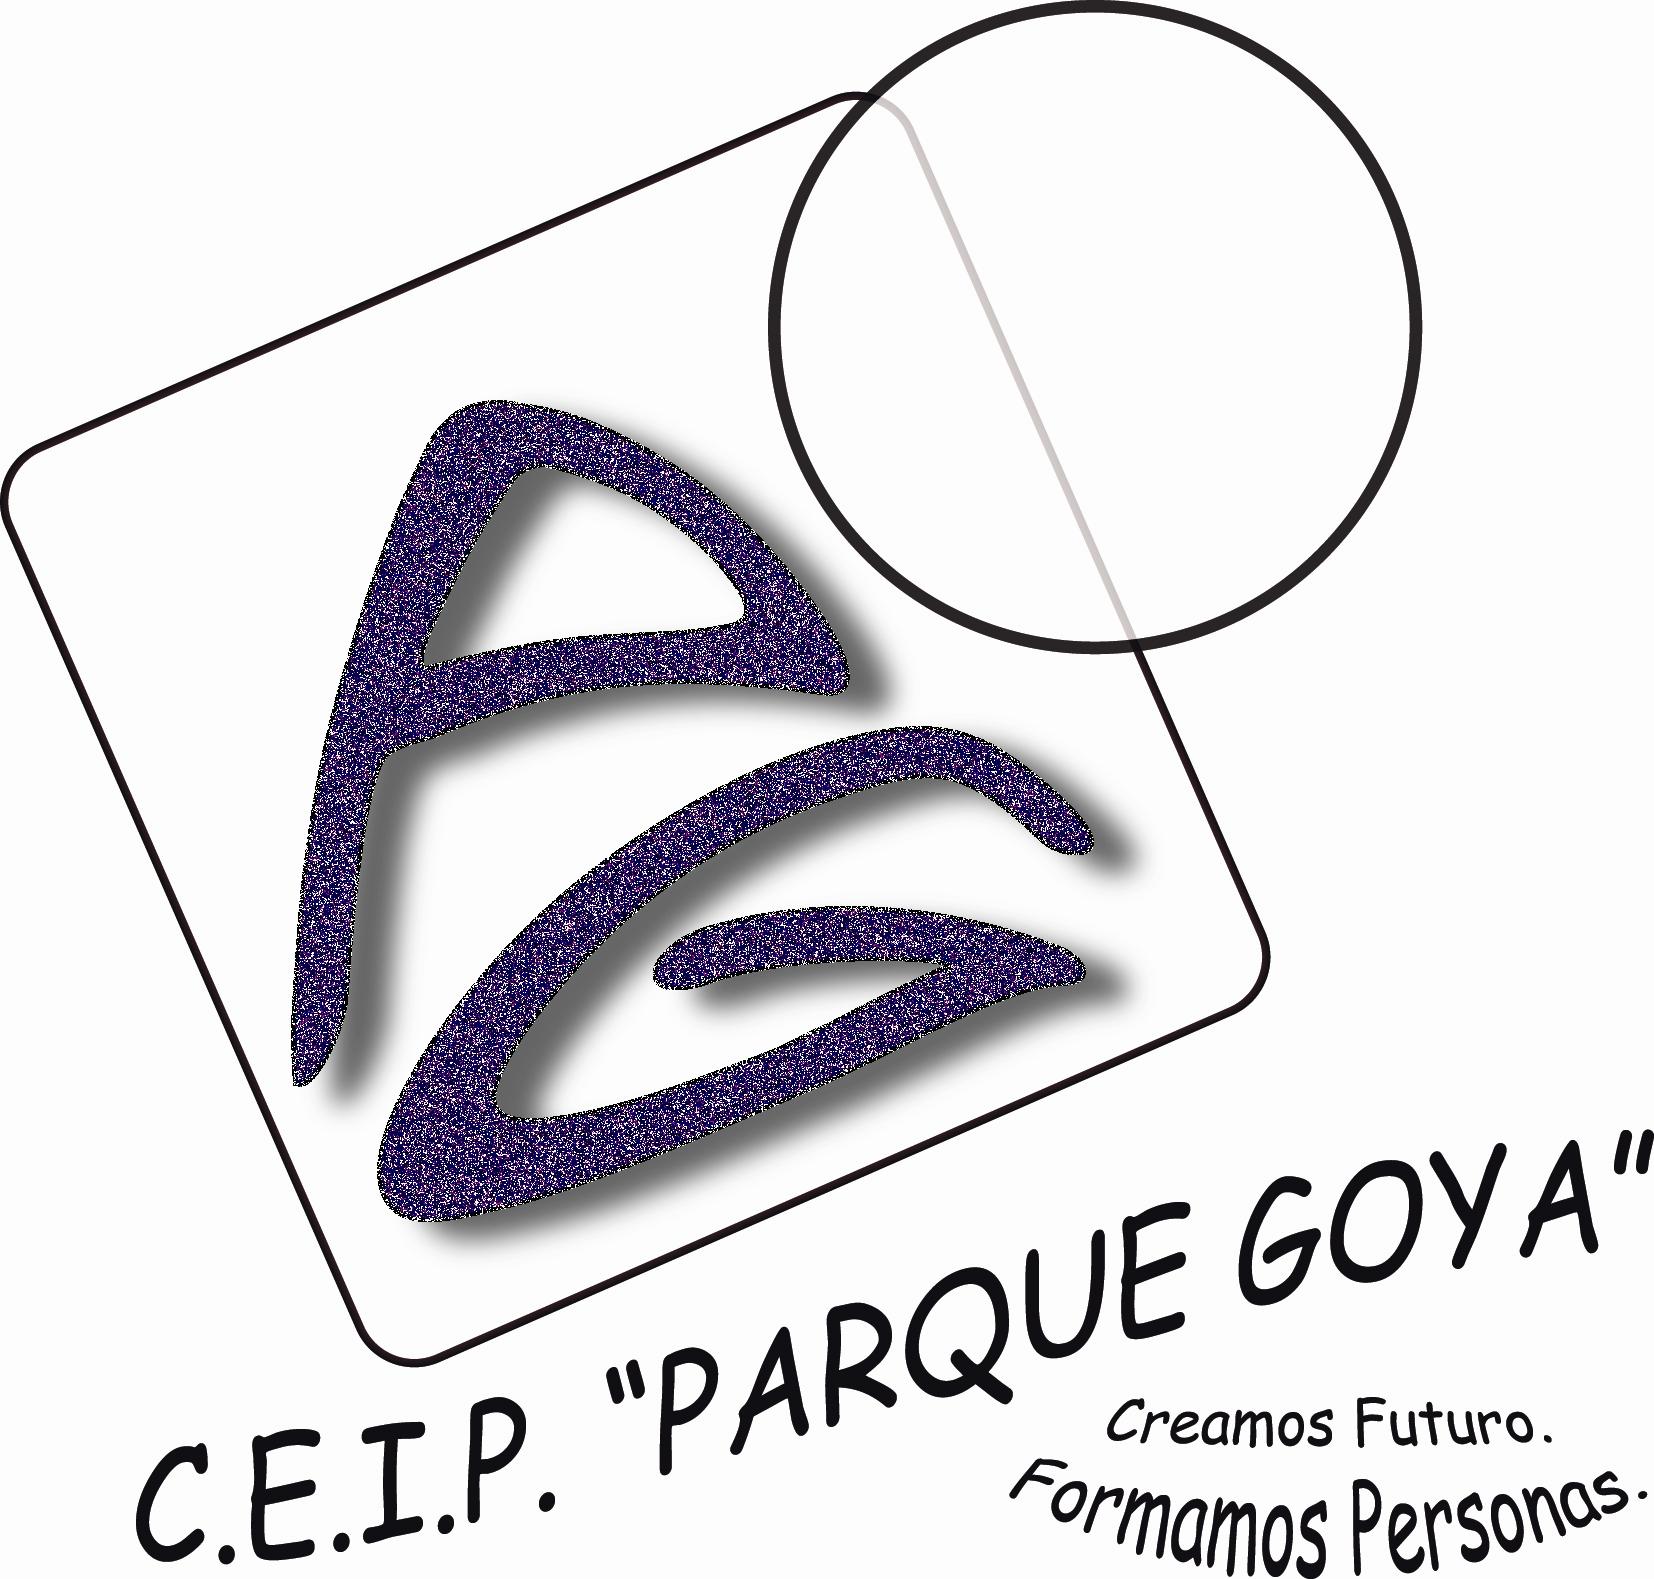 COLEGIO PARQUE GOYA